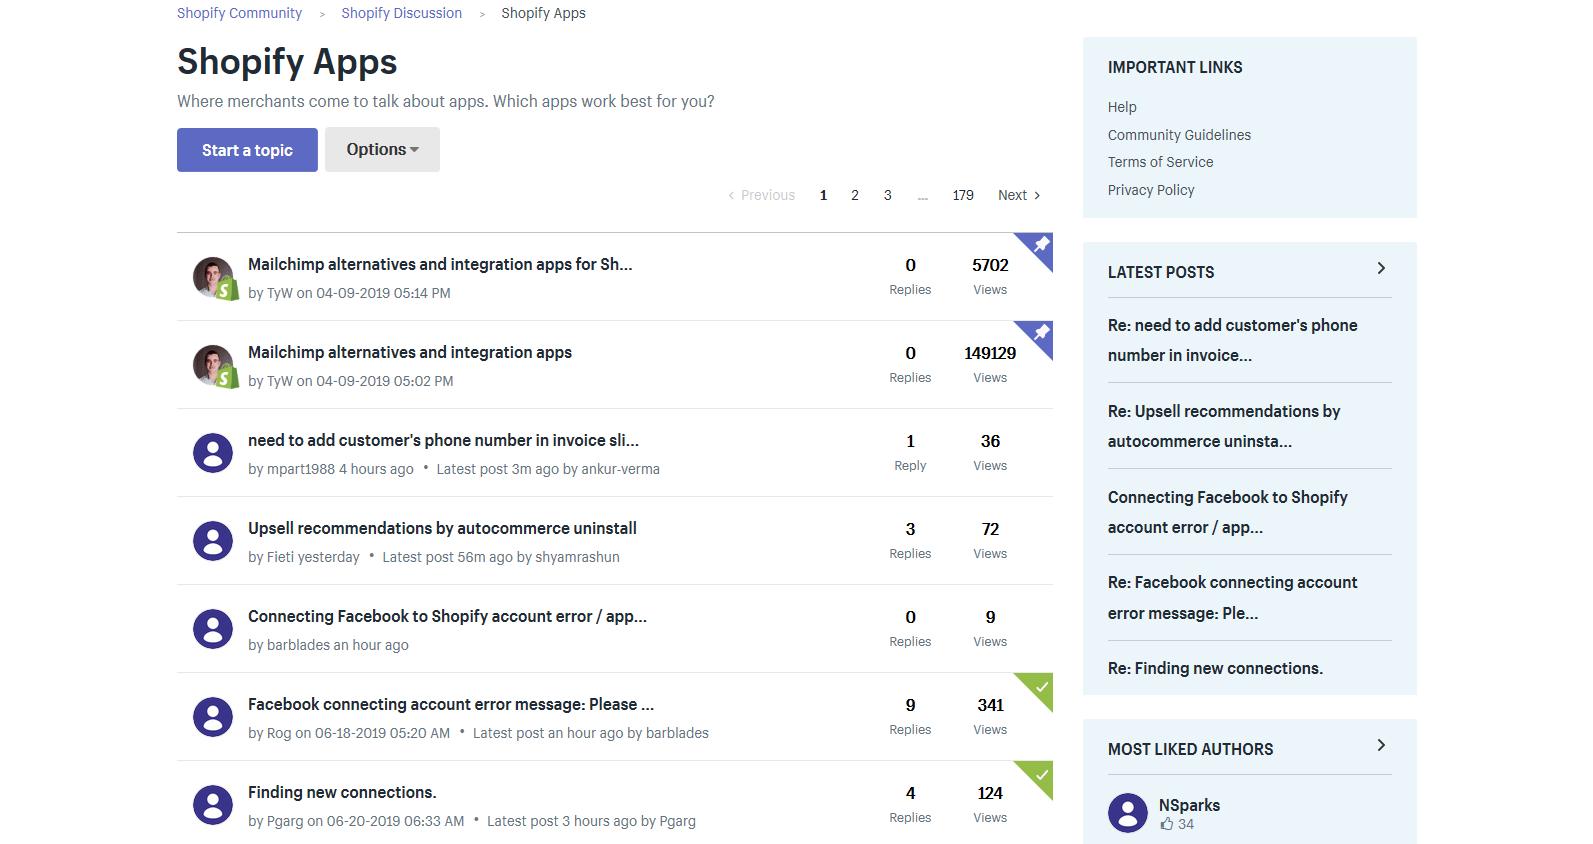 Connectplus shopify community